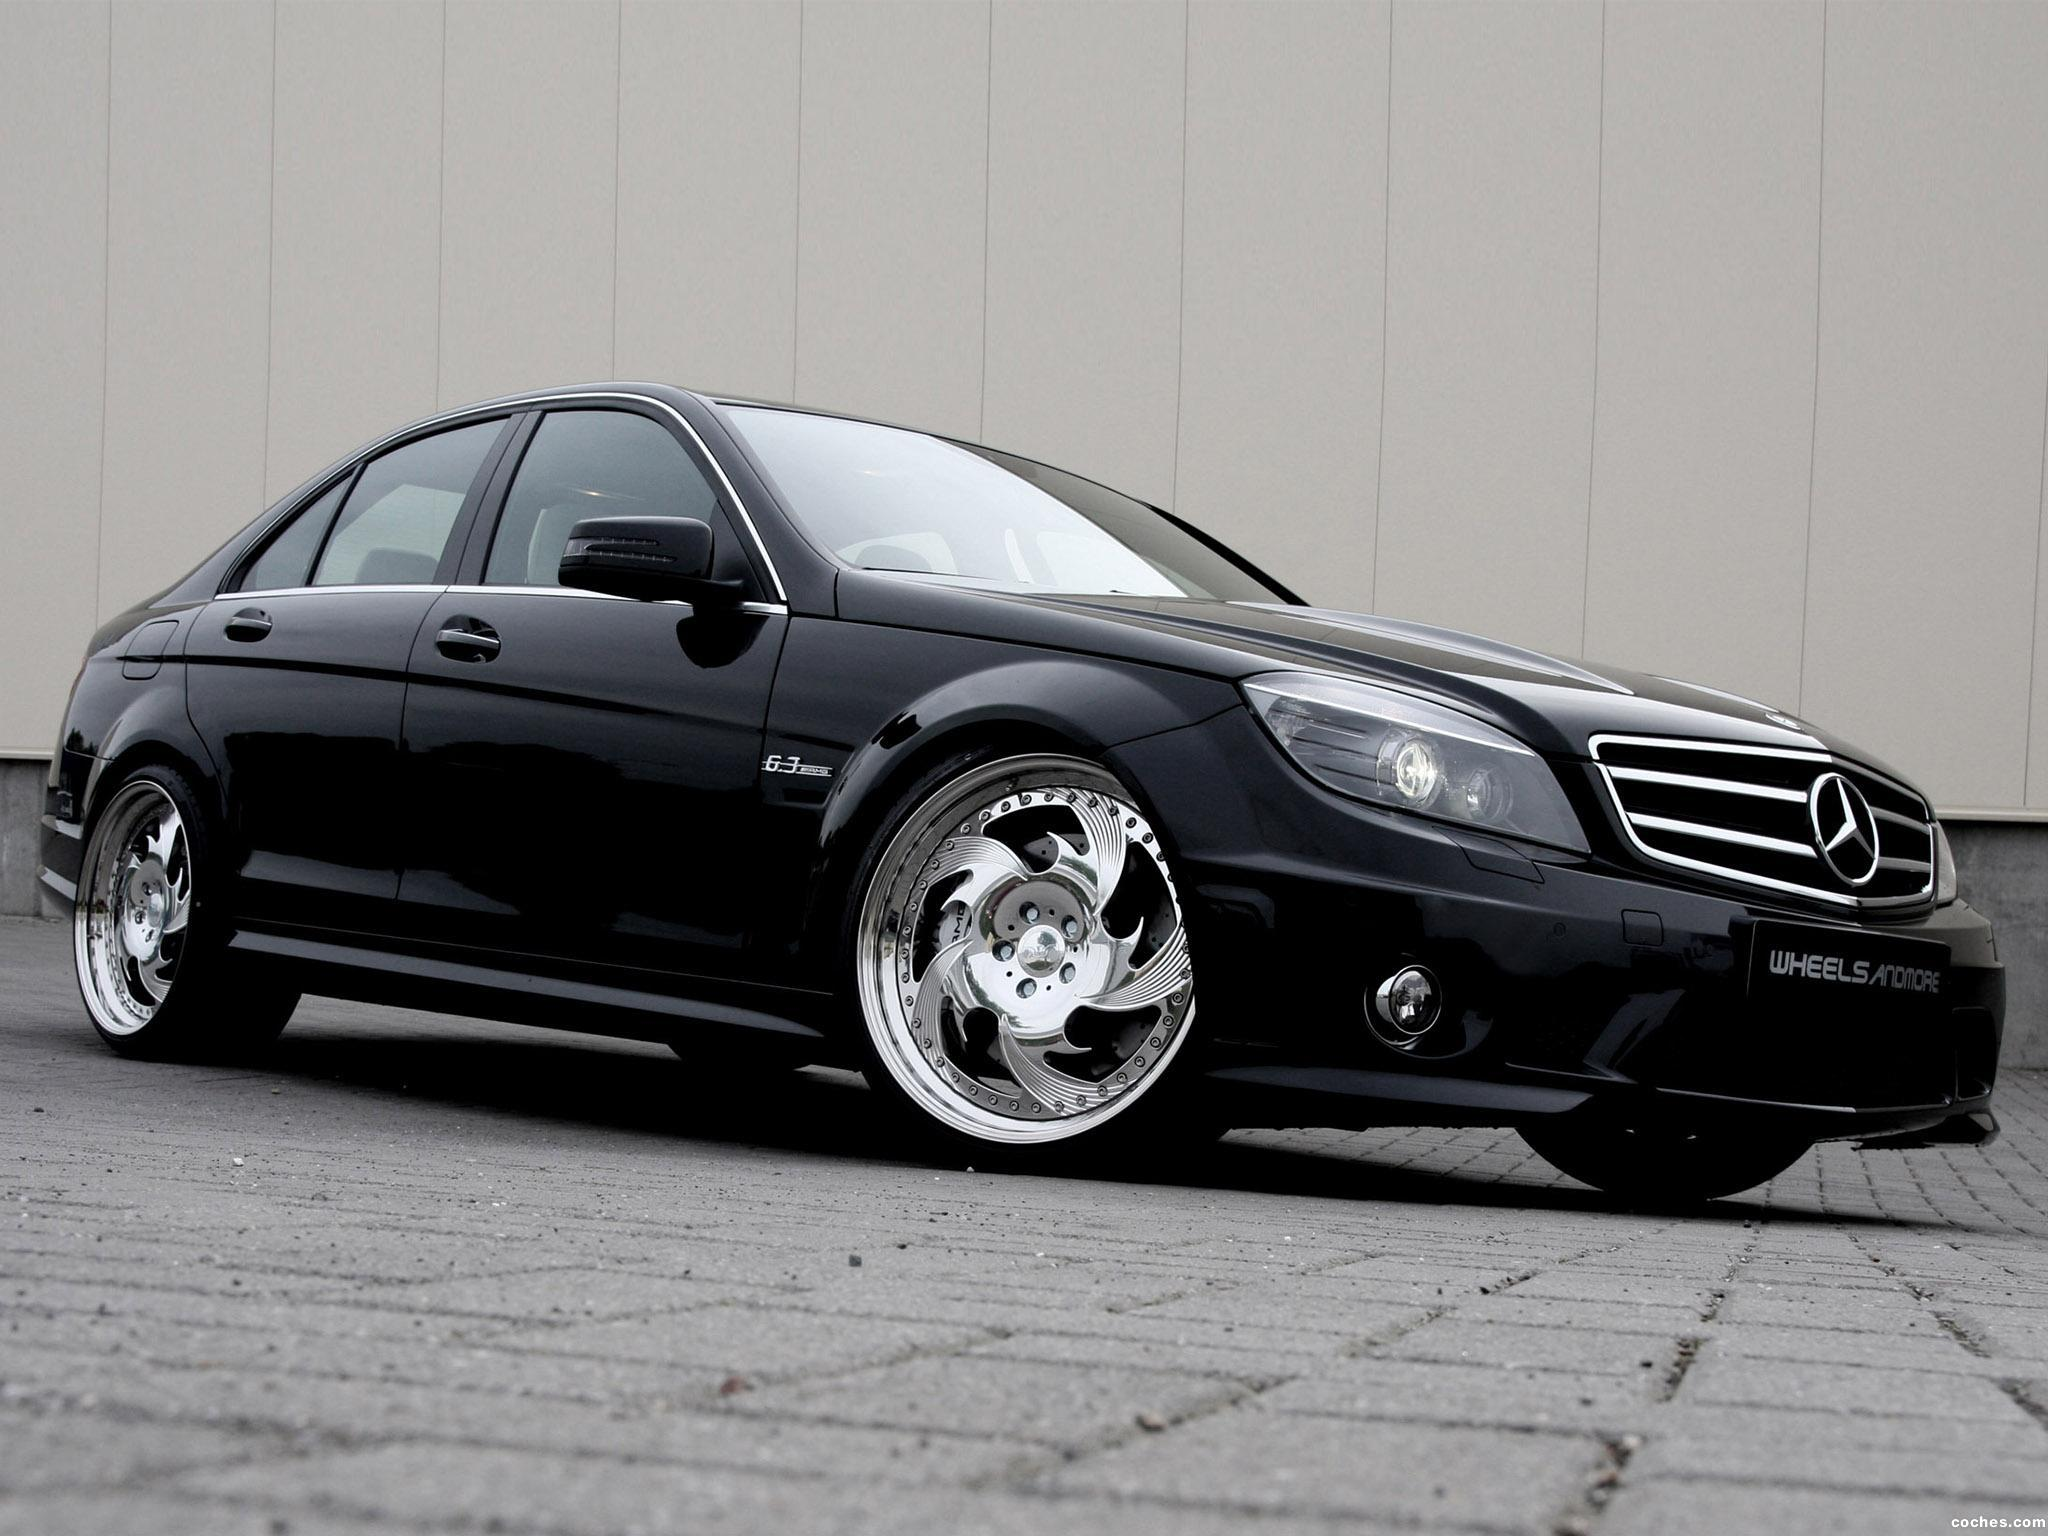 Foto 0 de Wheelsandmore Mercedes AMG C63 W204 2010